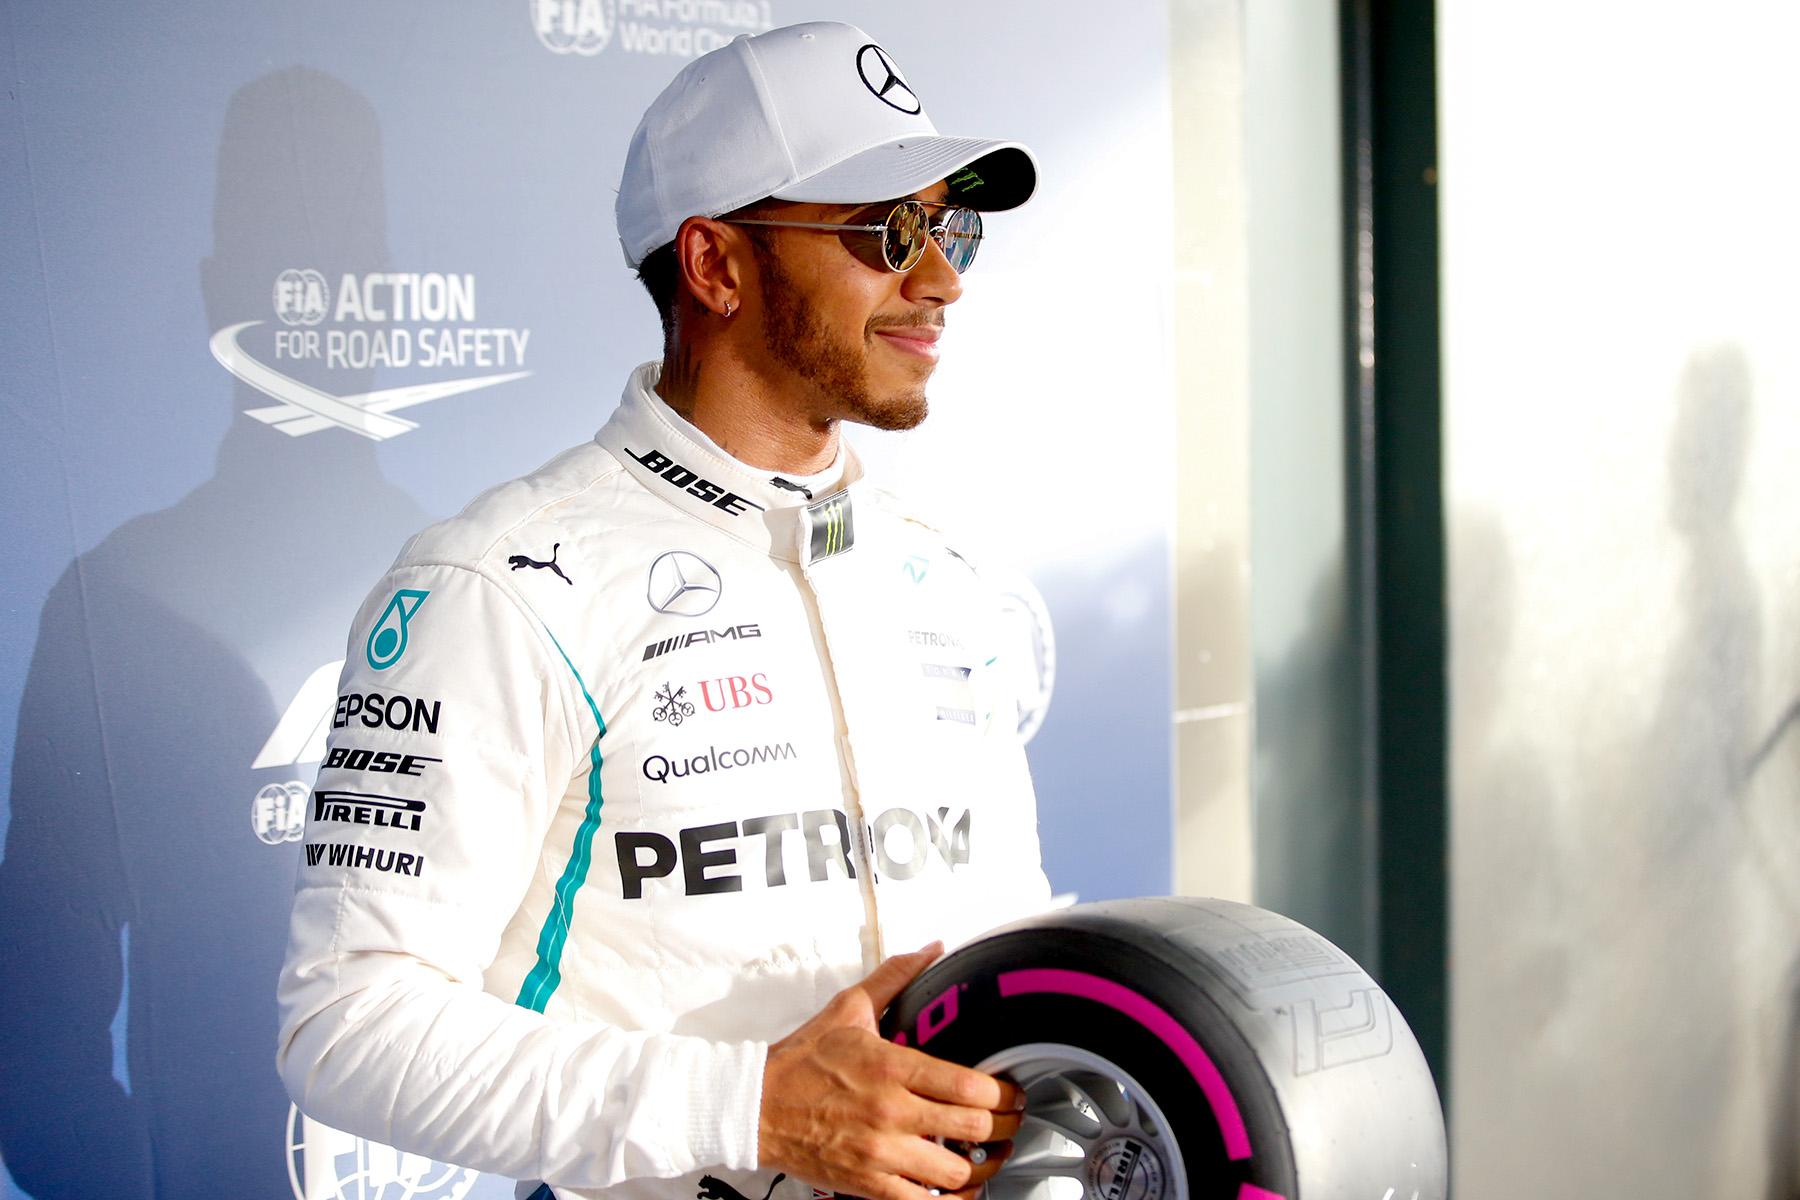 Lewis Hamilton wins the pole award at the Australian Grand Prix.